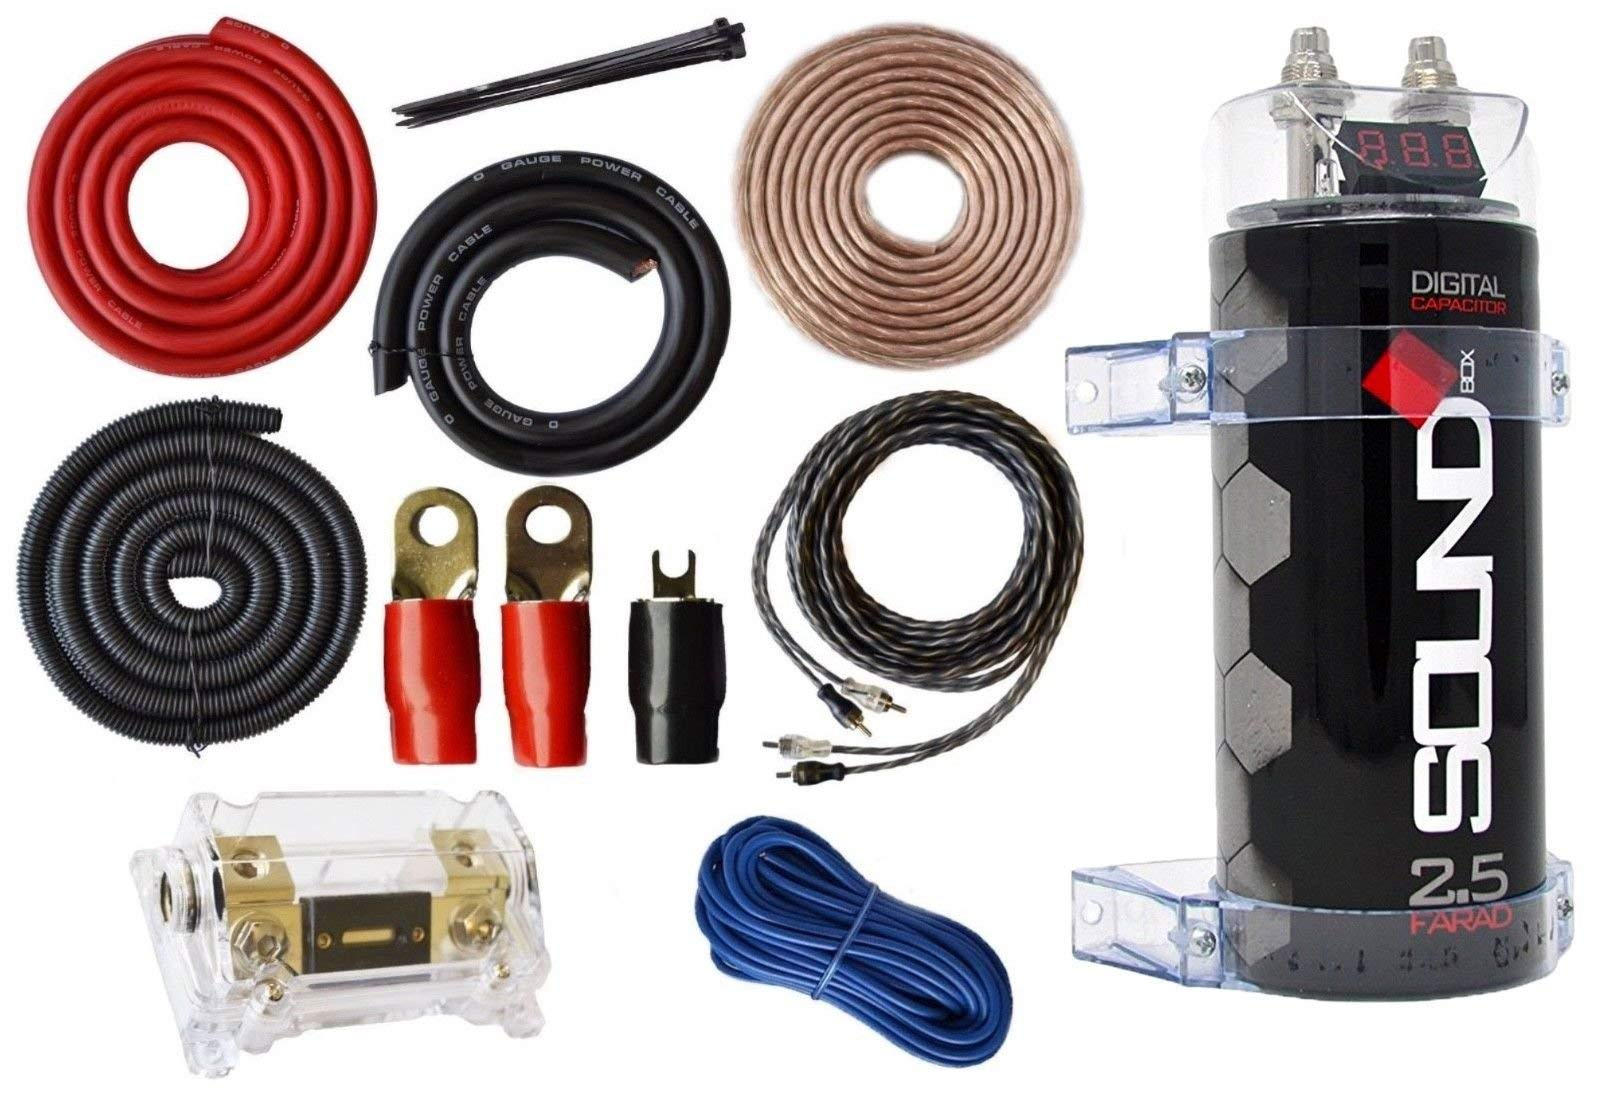 SoundBox 0 Gauge Amp Kit Amplifier Install Wiring & 2.5 Farad Digital Capacitor, 6000W Peak by SoundBox